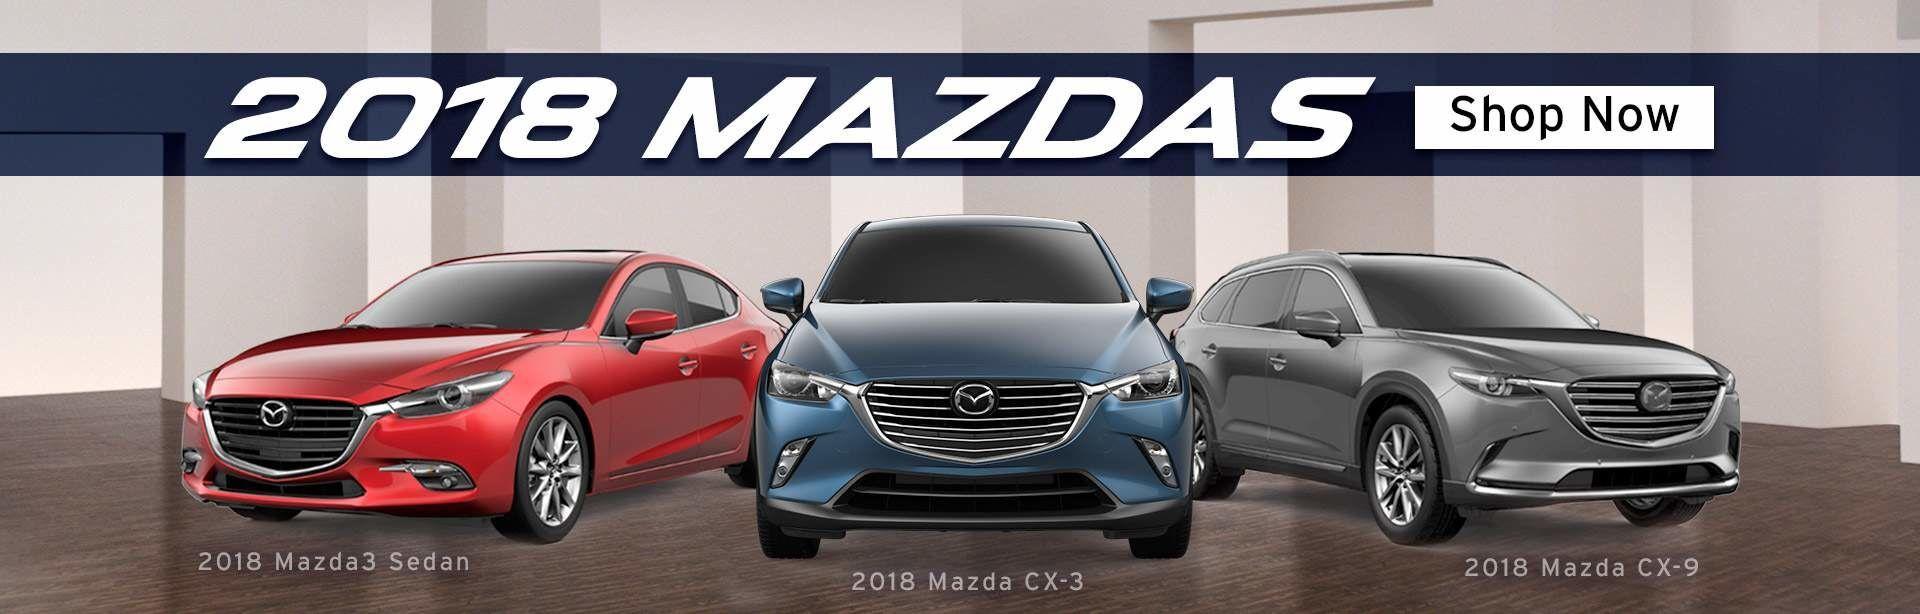 Mazda Dealership Hickory Nc Used Cars Hickory Mazda